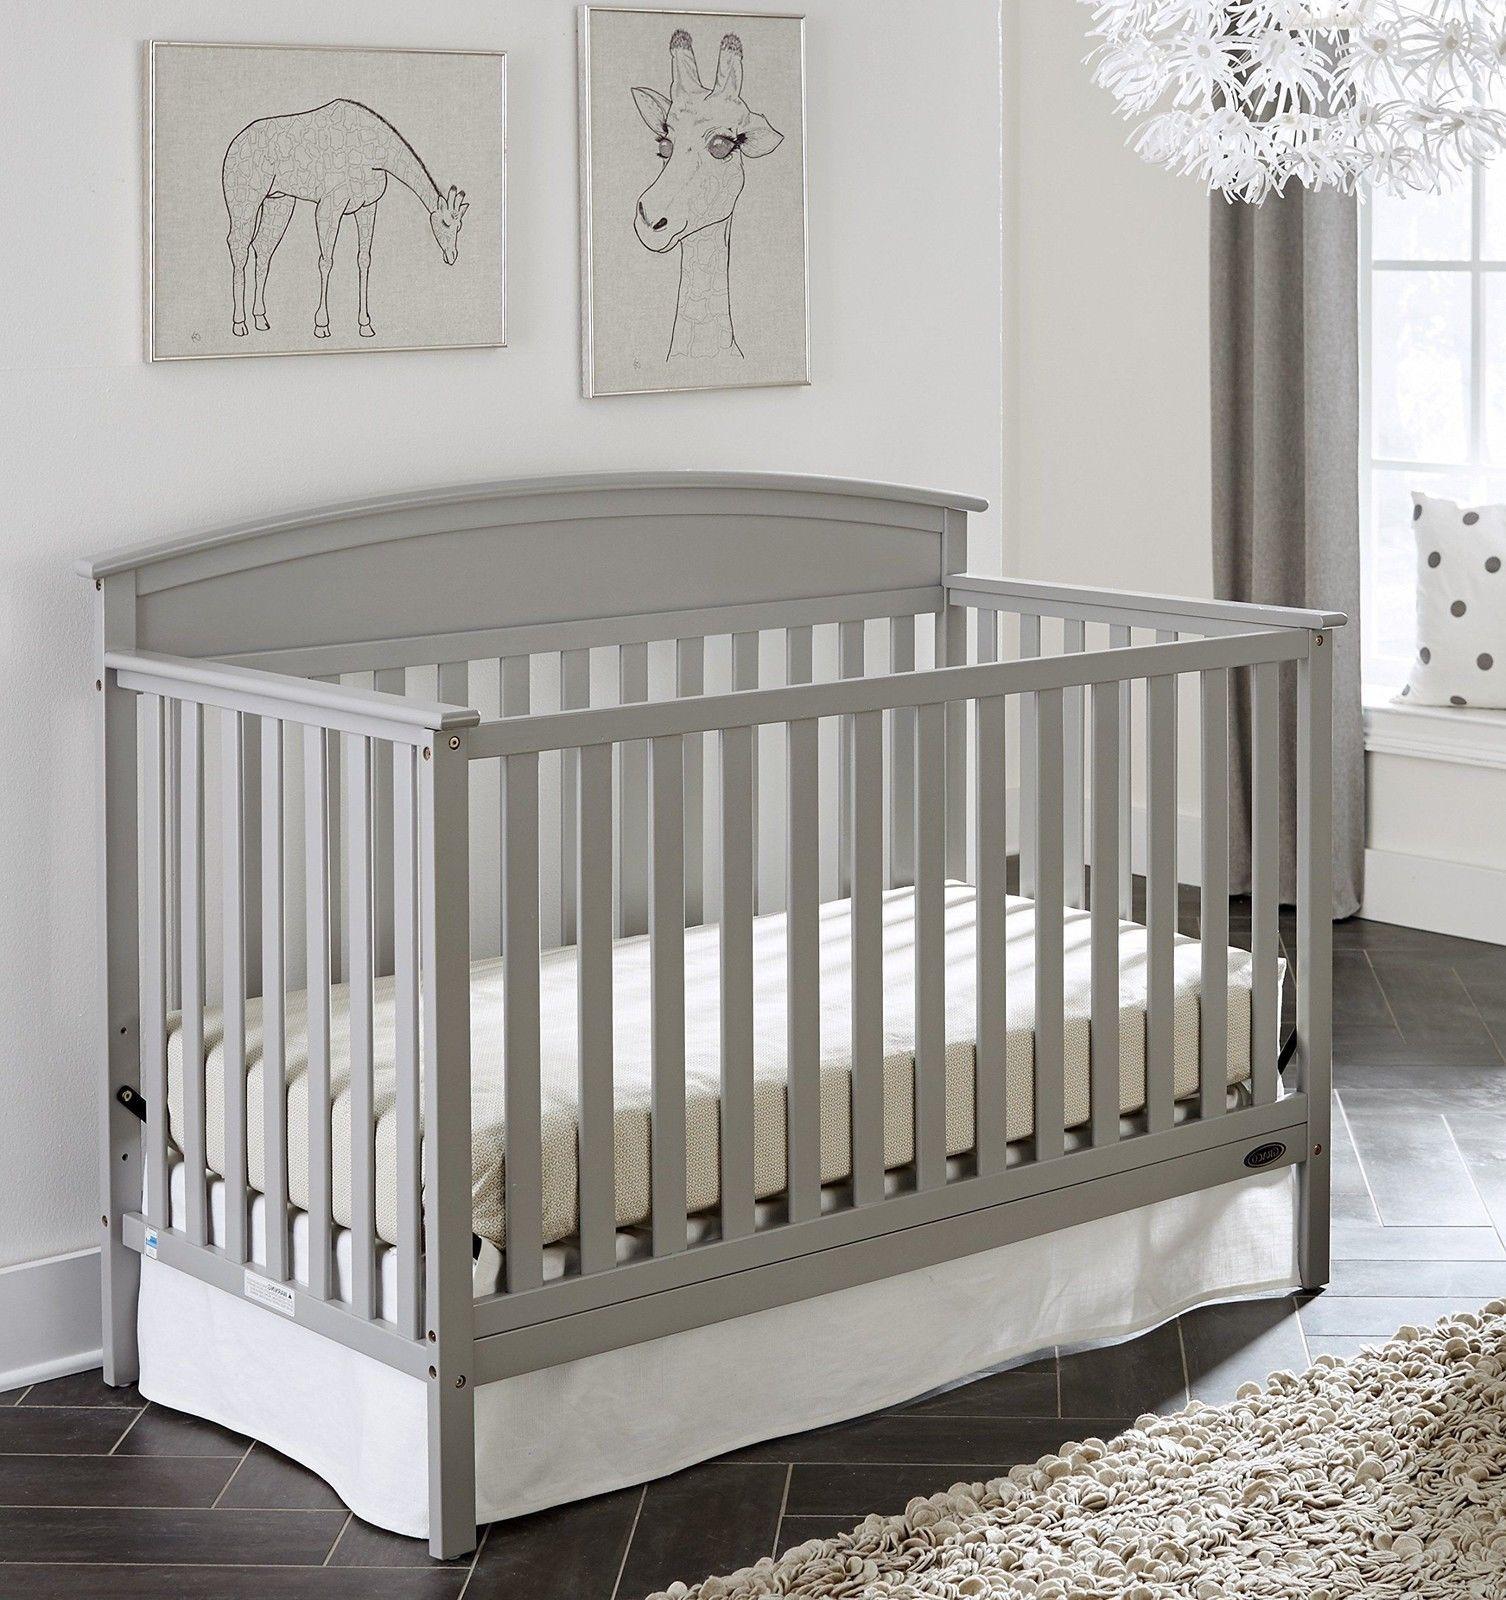 Gray Convertible Crib 5 In 1 Nursery Furniture Baby Bed Sleeper Graco Wood Frame